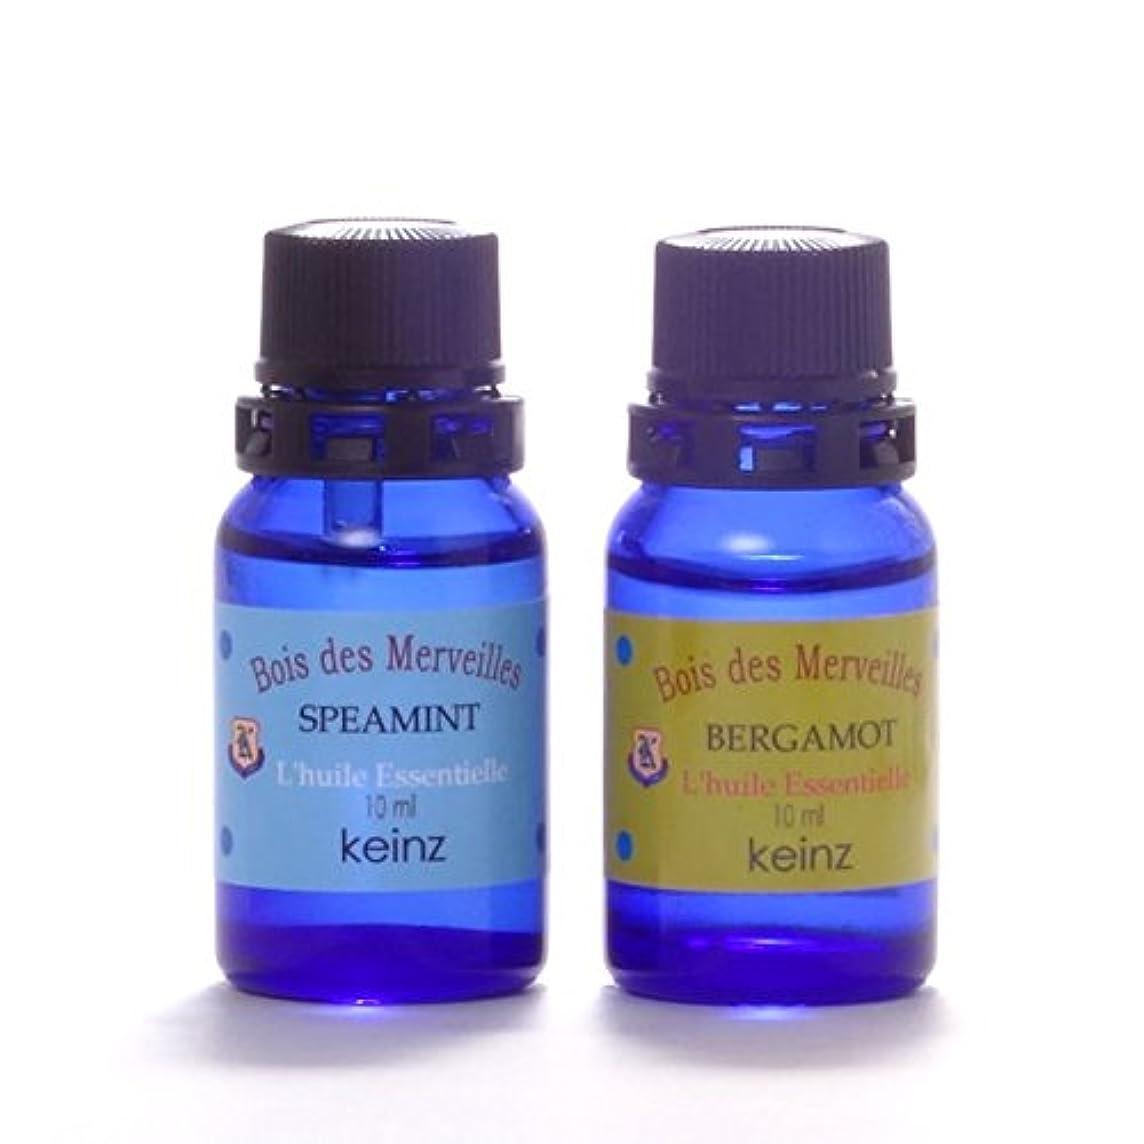 keinzエッセンシャルオイル「ベルガモット10ml&スペアミント10ml」2種1セット ケインズ正規品 製造国アメリカ 完全無添加 人工香料は使っていません。